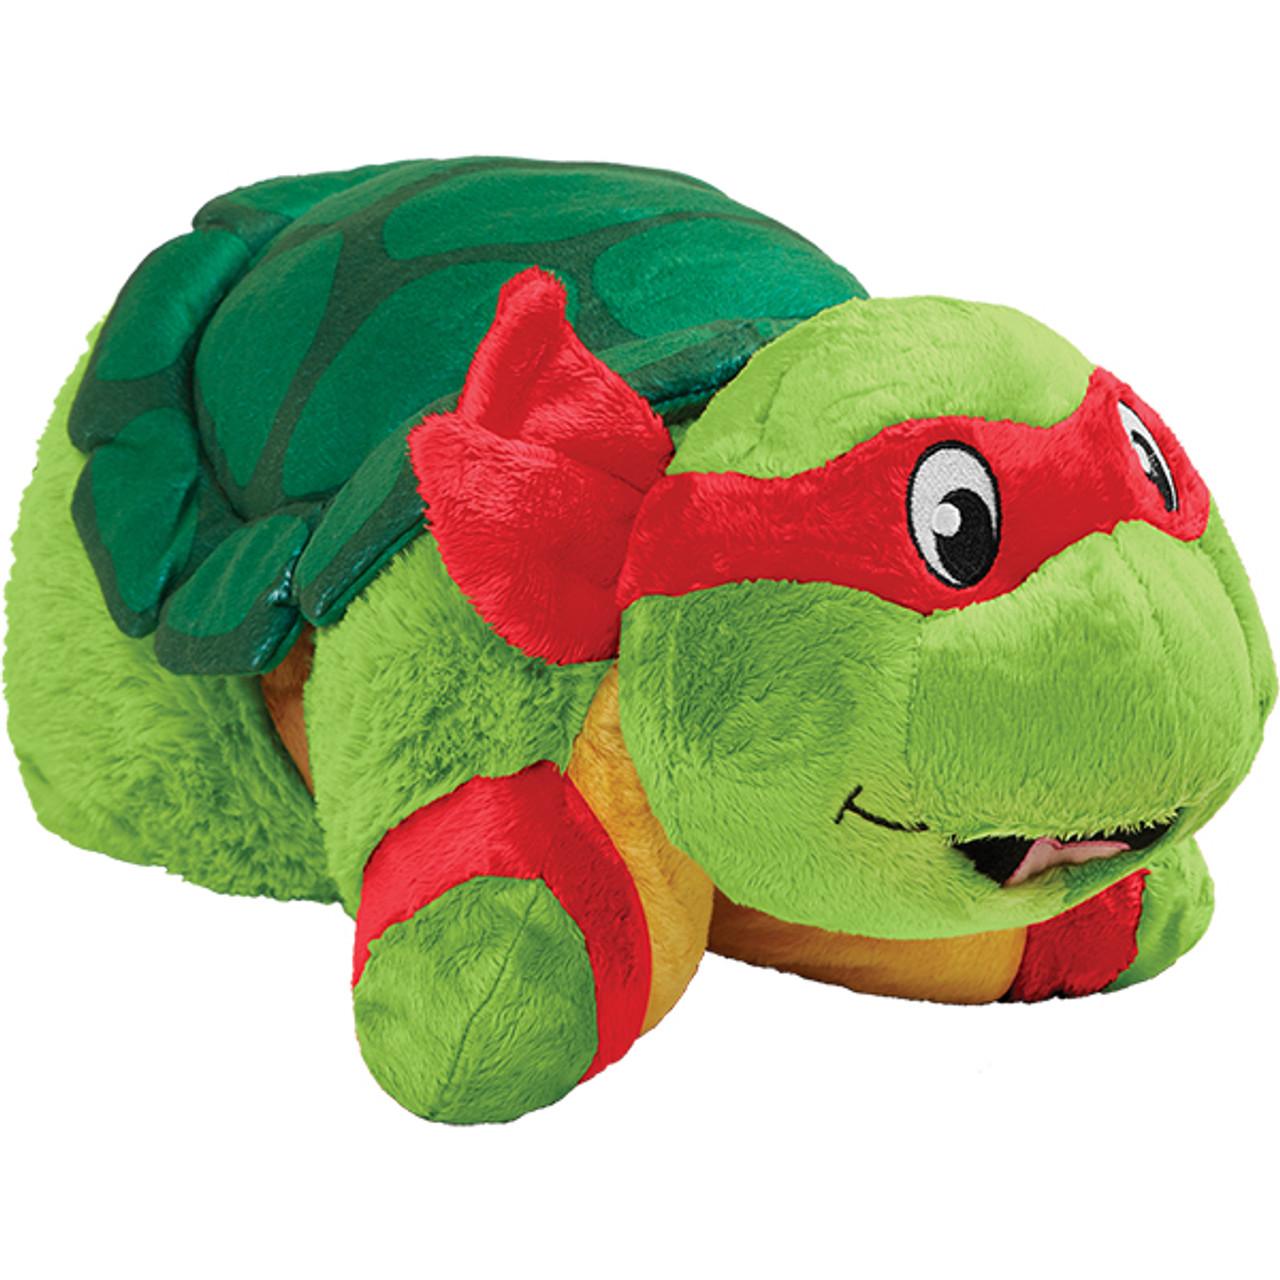 nickelodeon teenage mutant ninja turtles raphael pillow pet